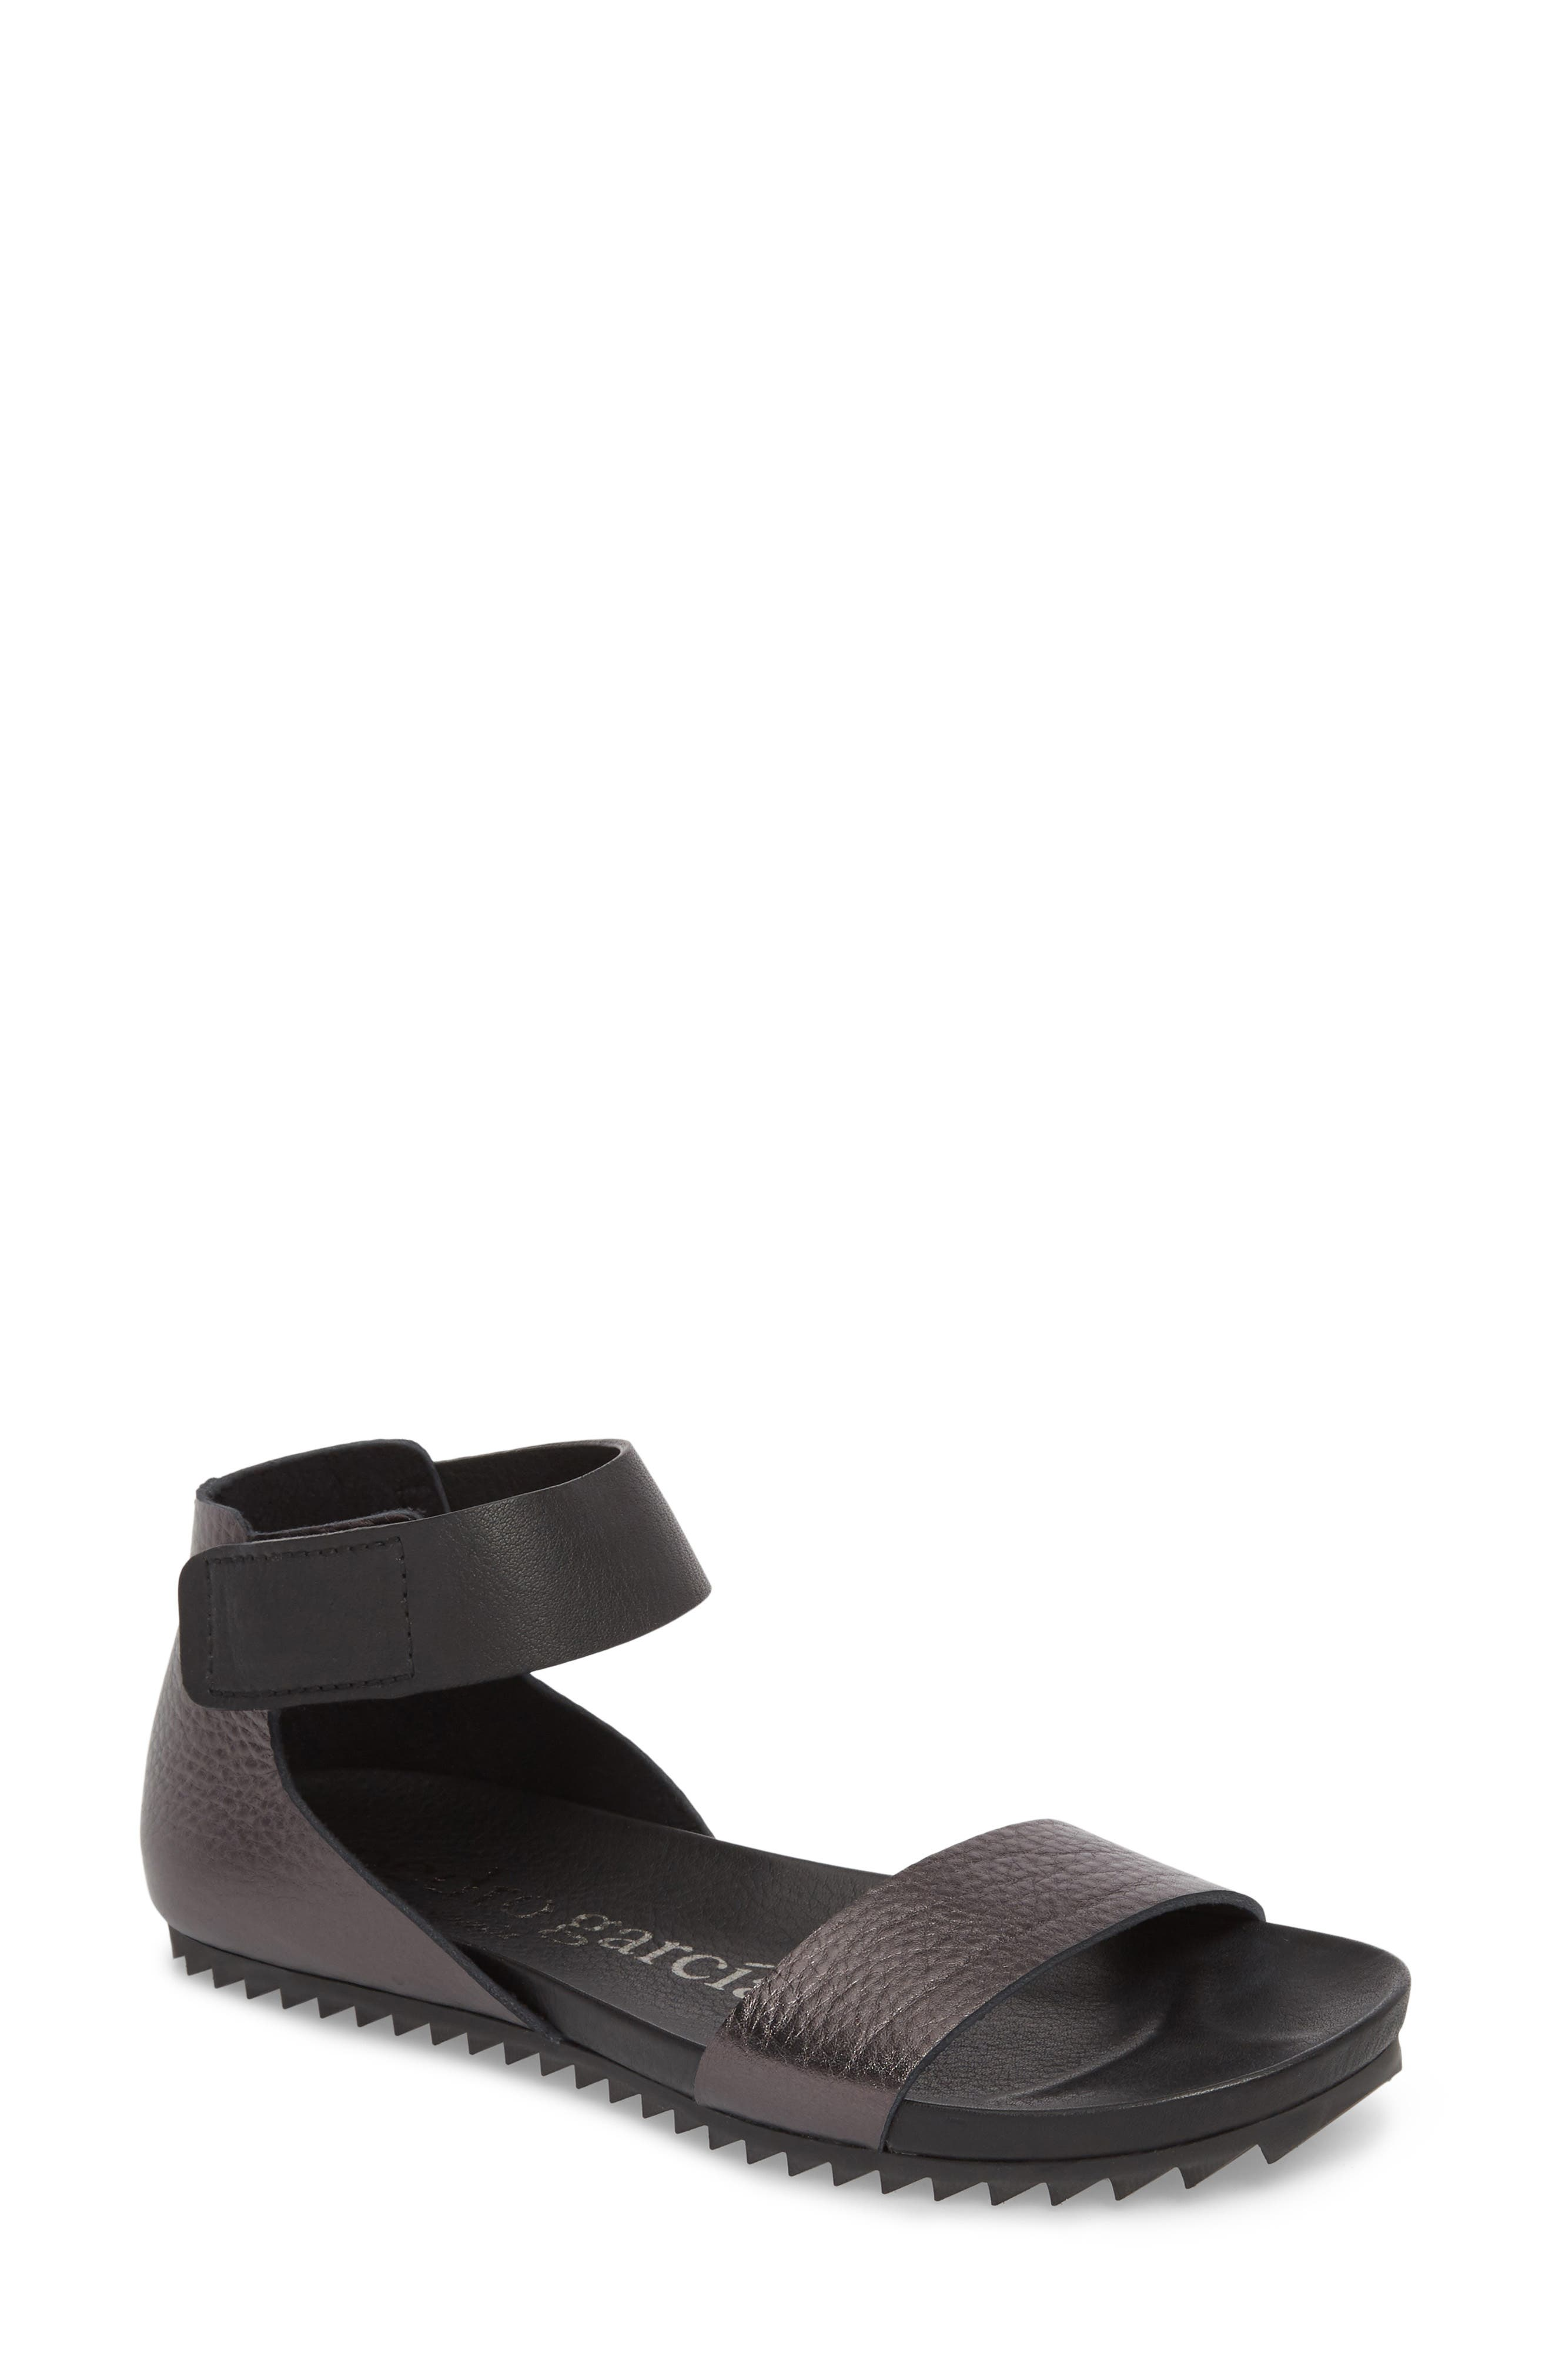 Jalila Ankle Strap Sandal,                         Main,                         color, Fox Cervo Lame